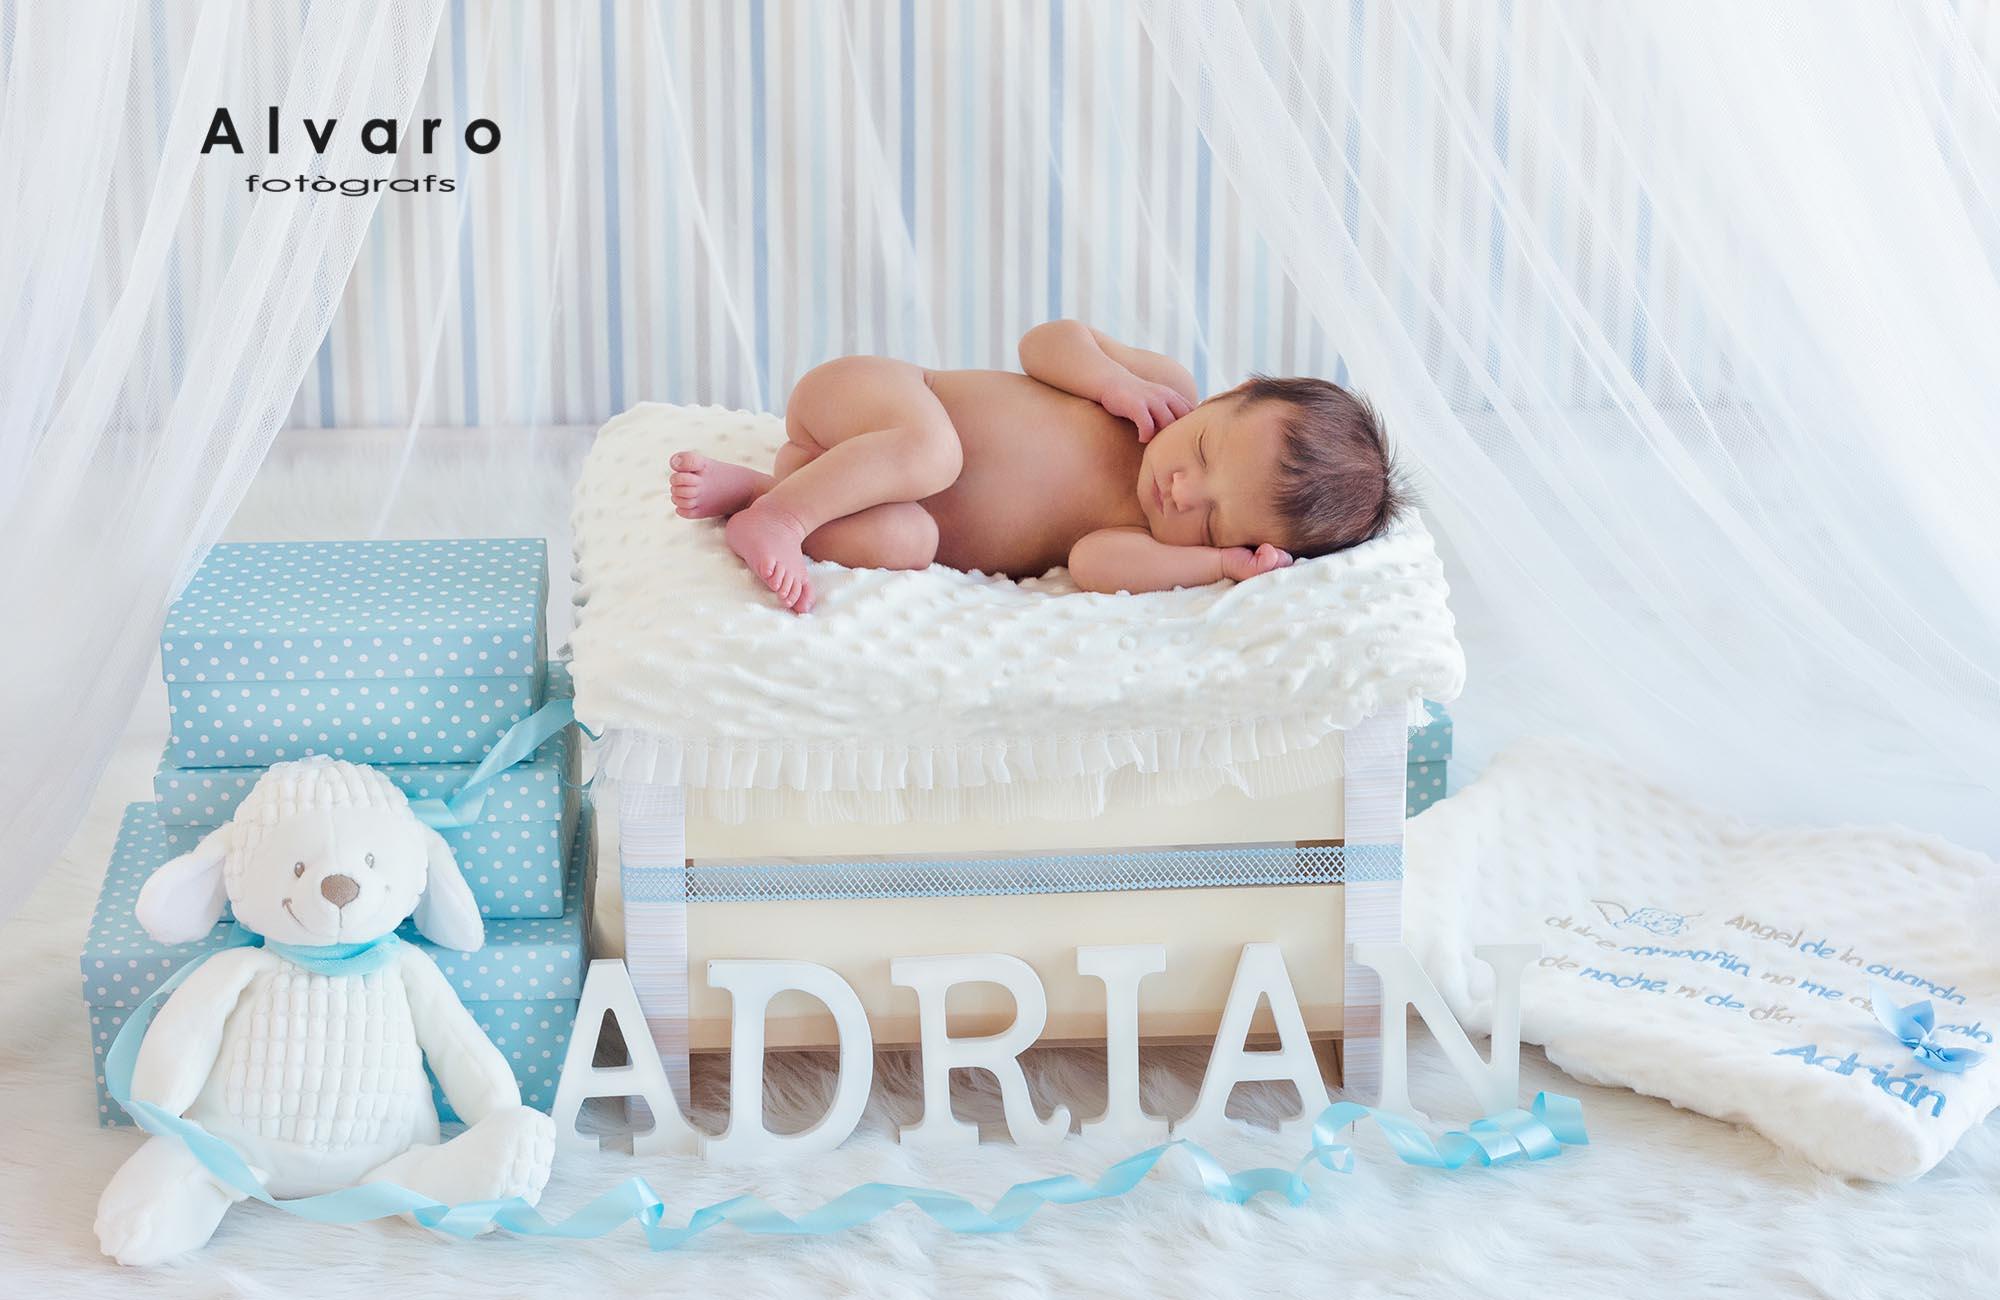 adrian1